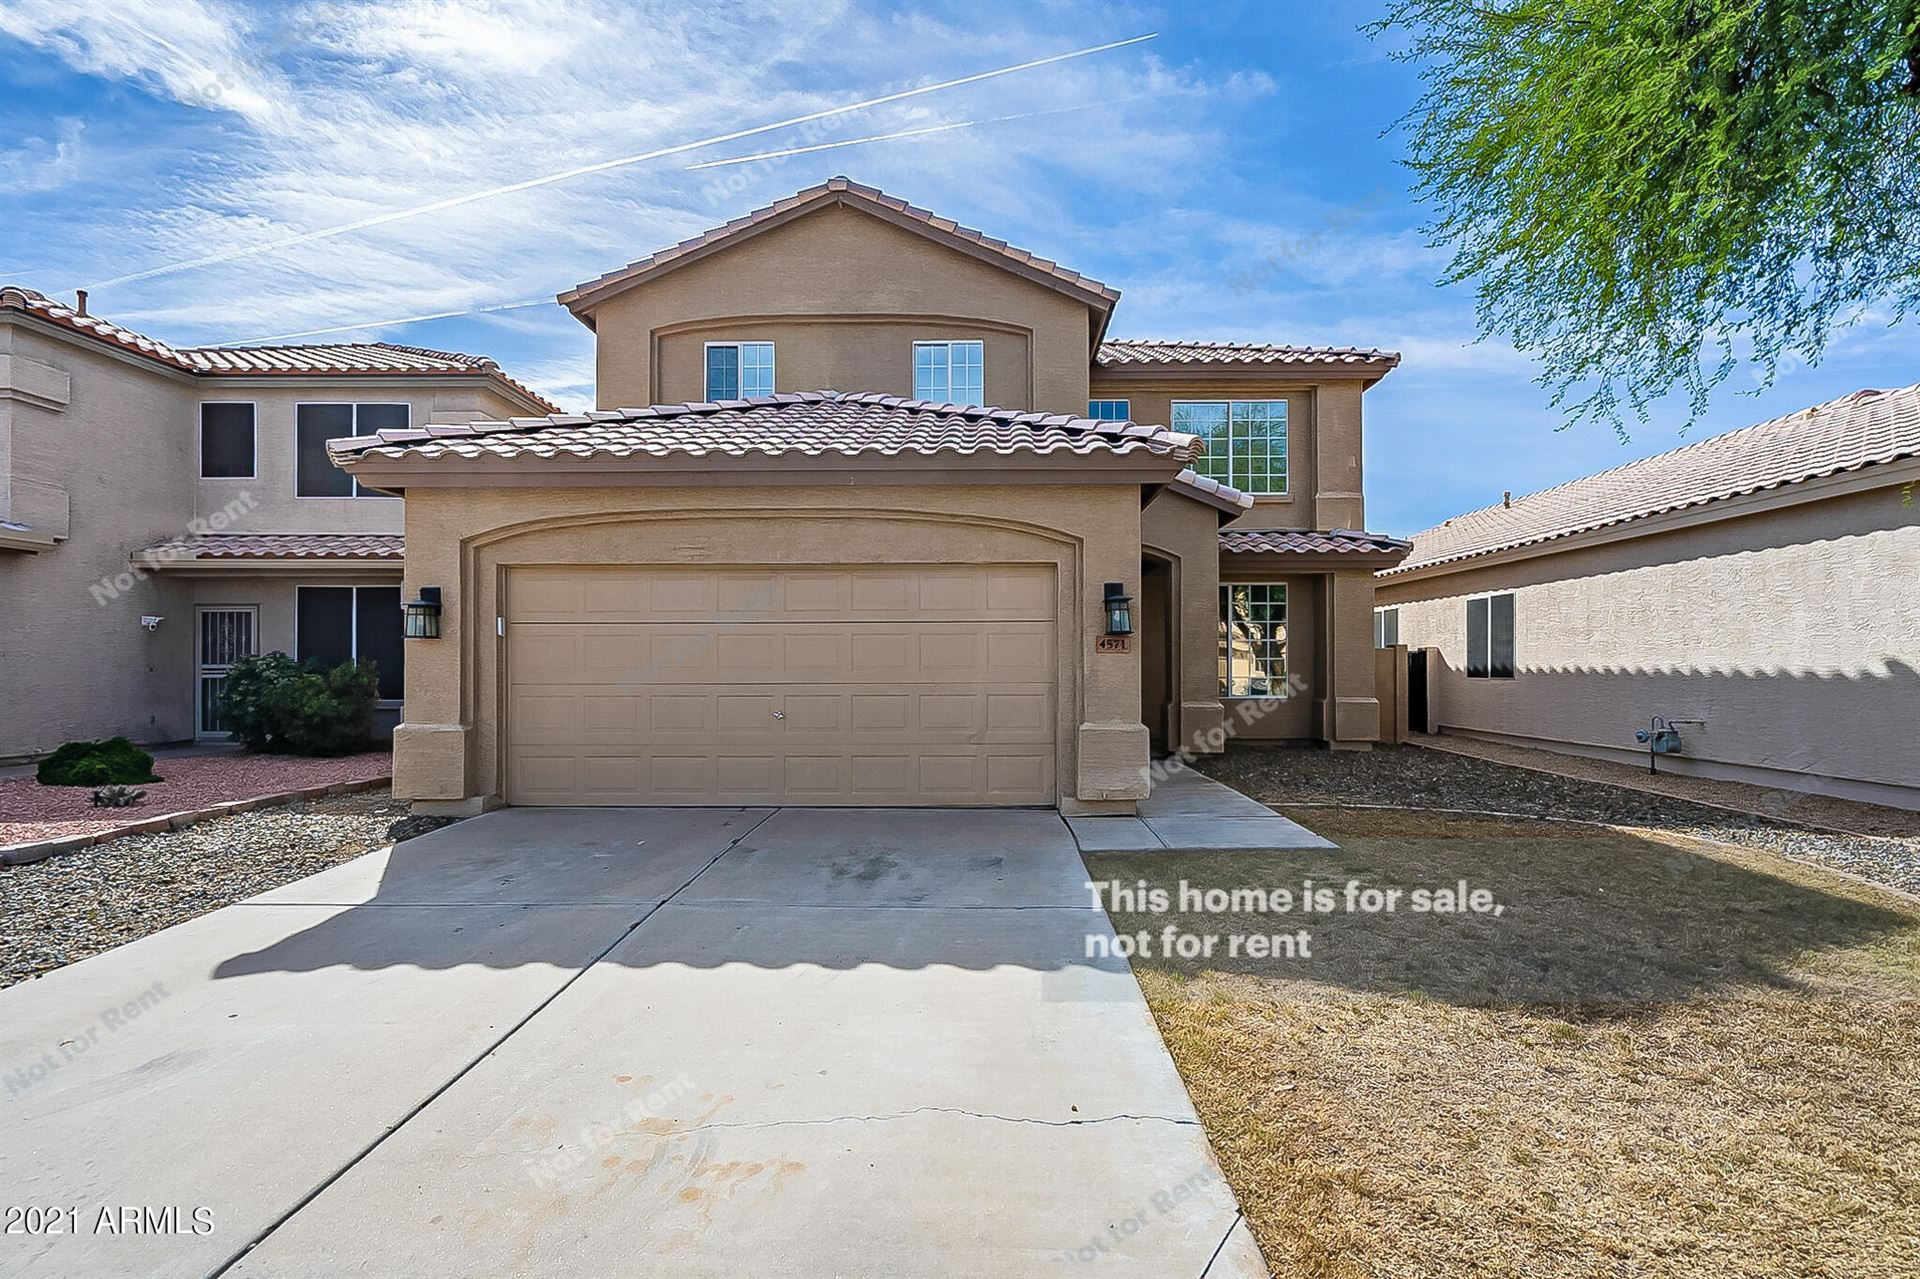 Photo of 4571 W TOLEDO Street, Chandler, AZ 85226 (MLS # 6311079)